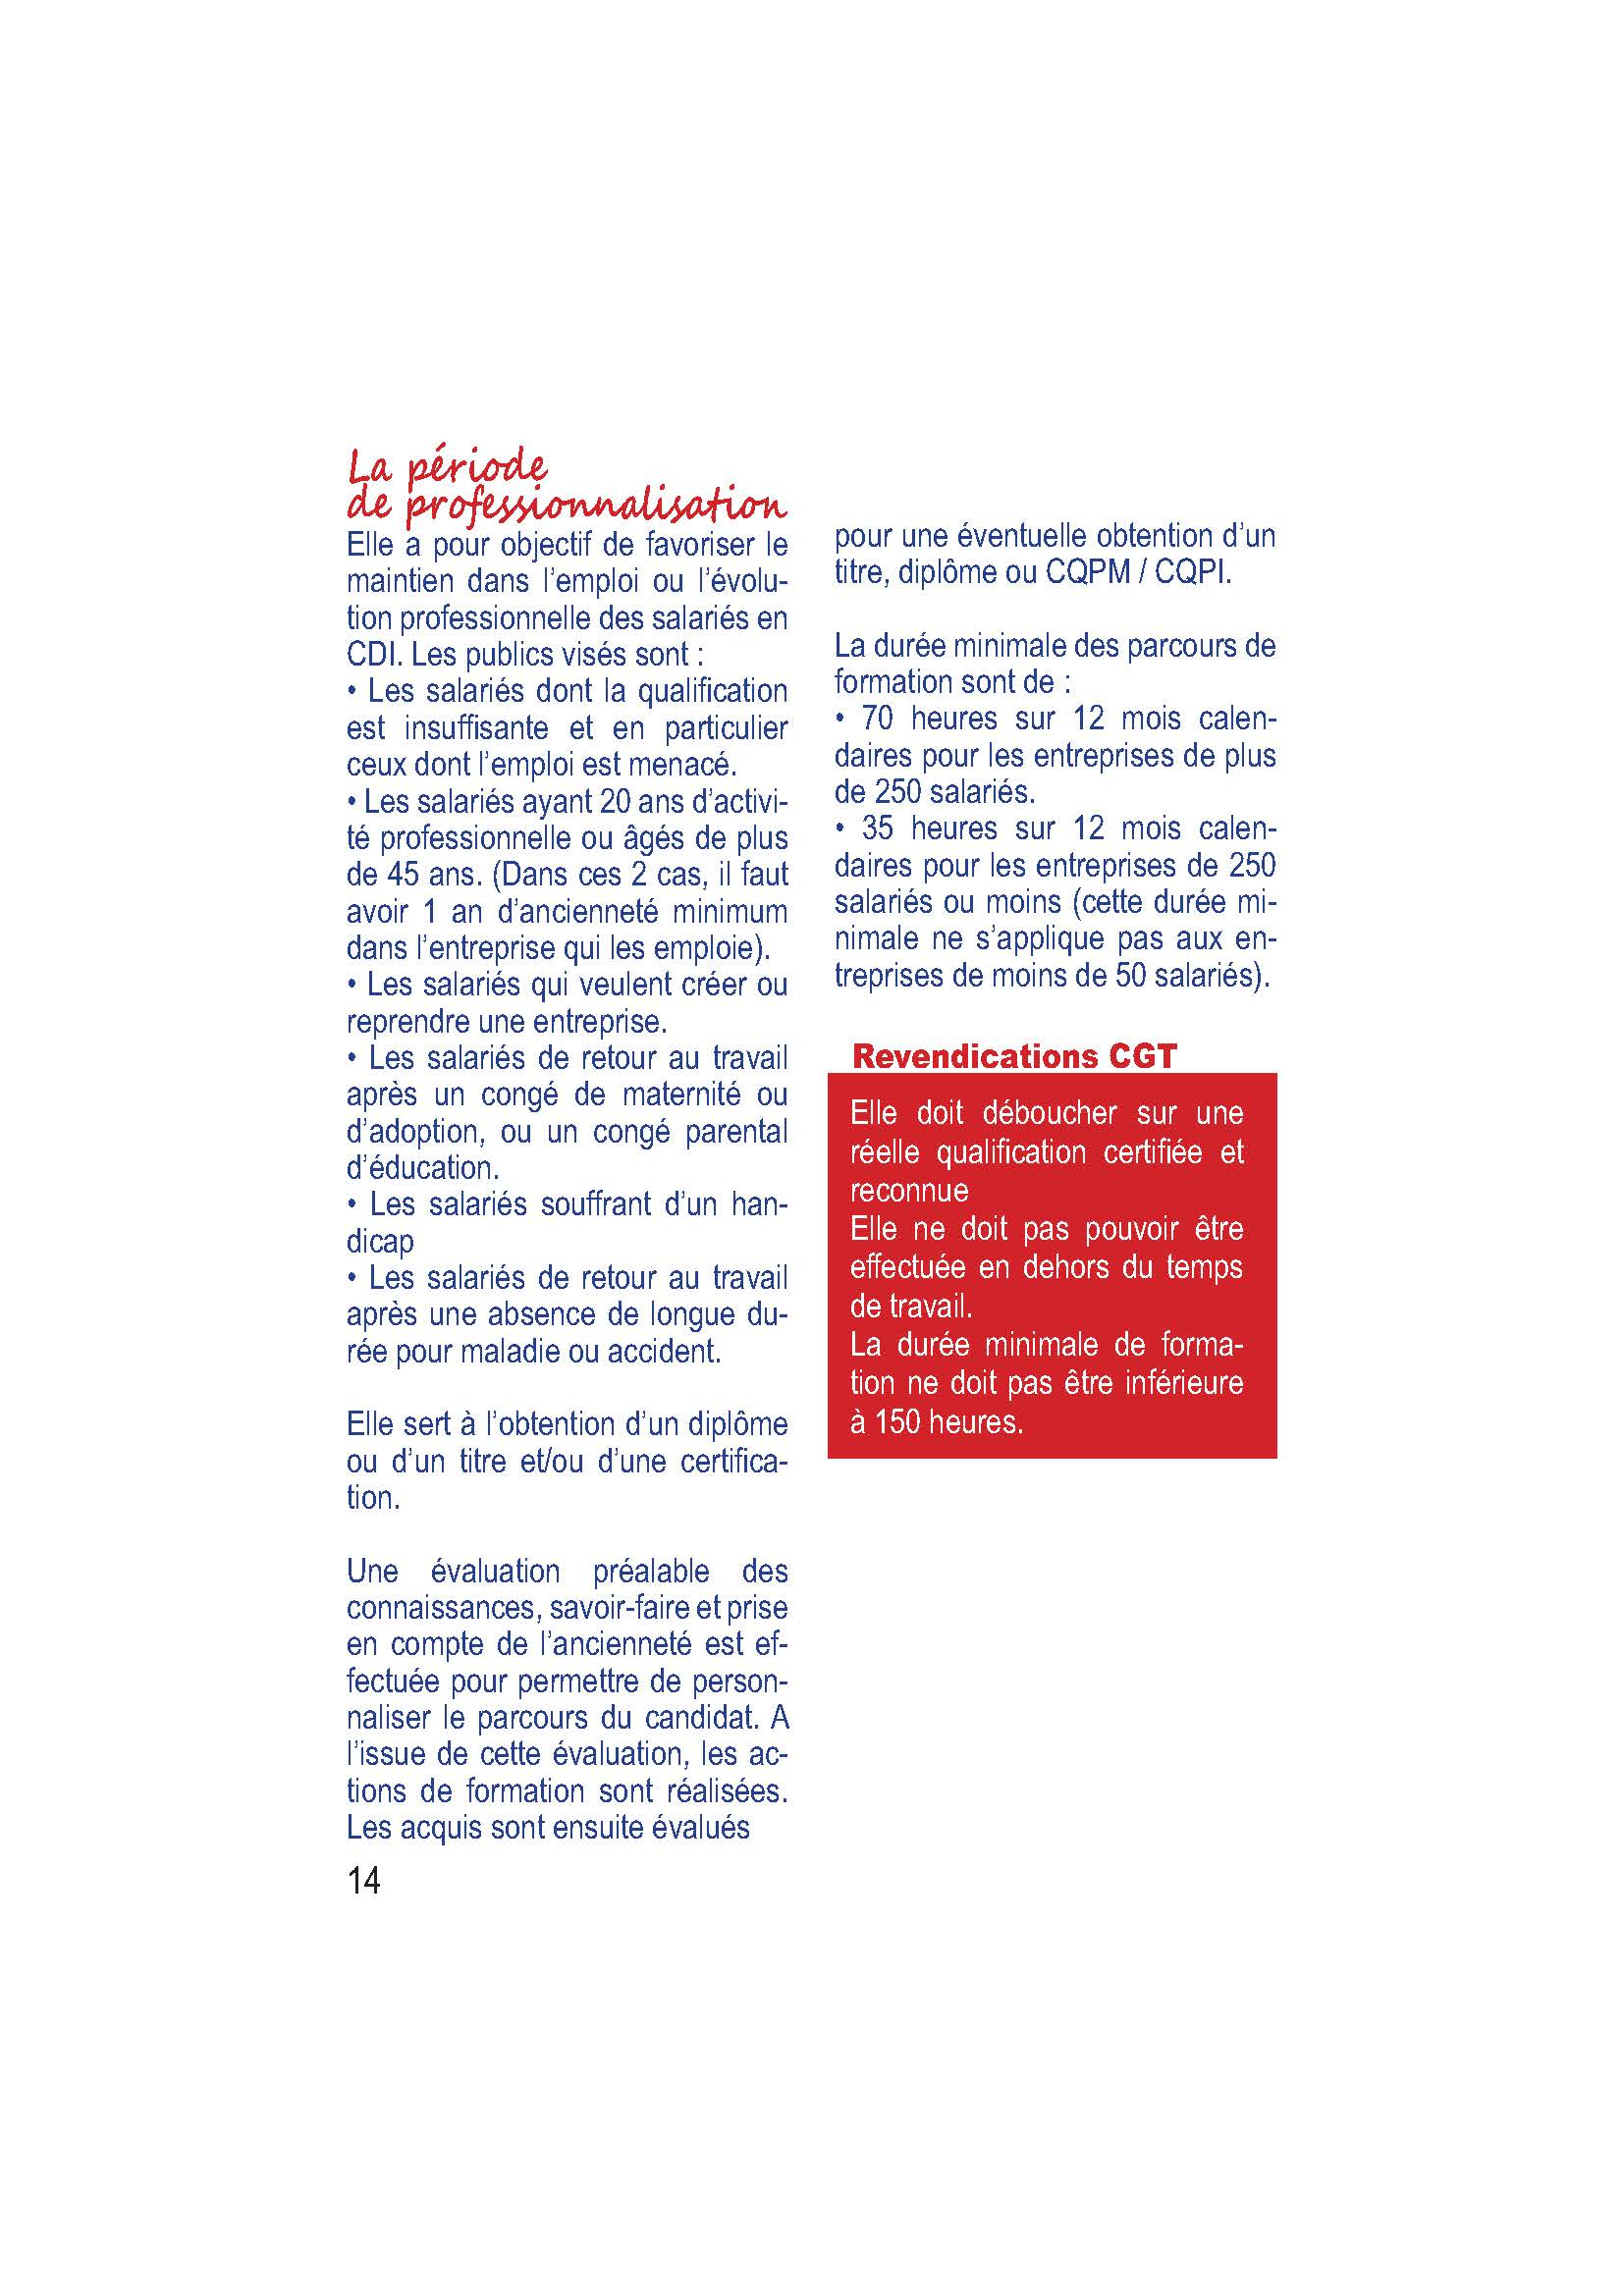 Livret Formation Professionelle_Page_14